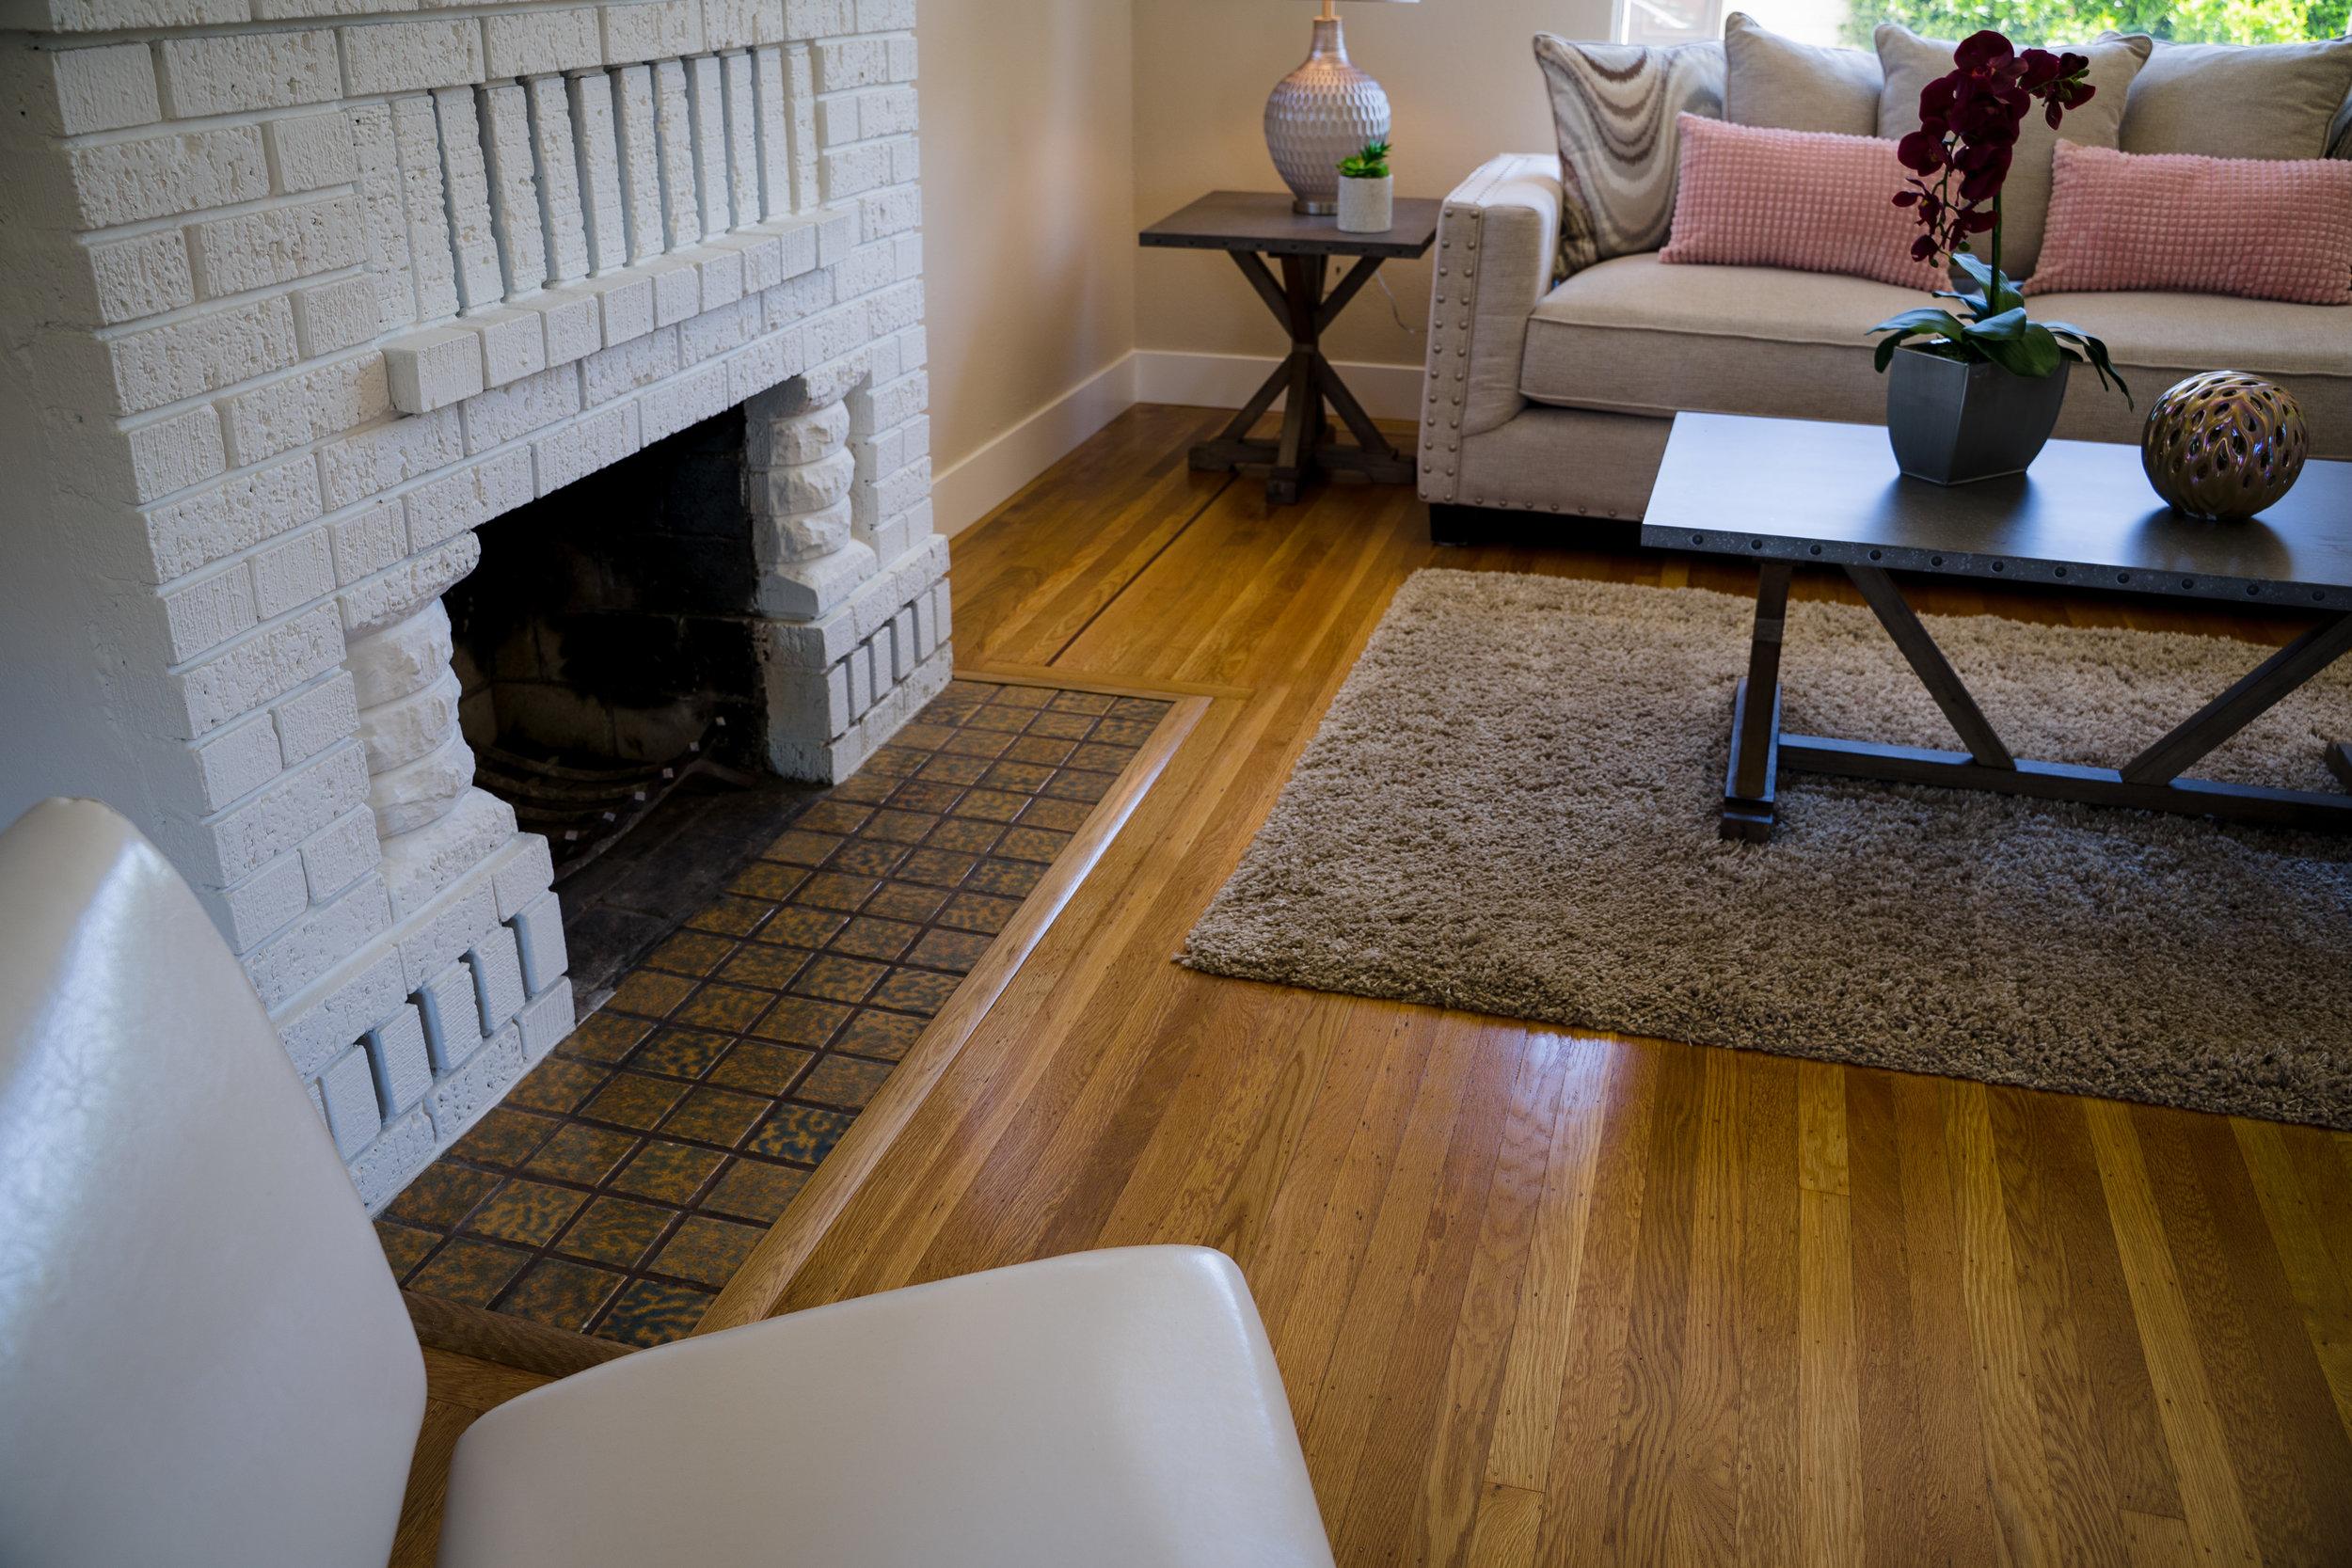 Sequoia Ricardo House-01439.jpg